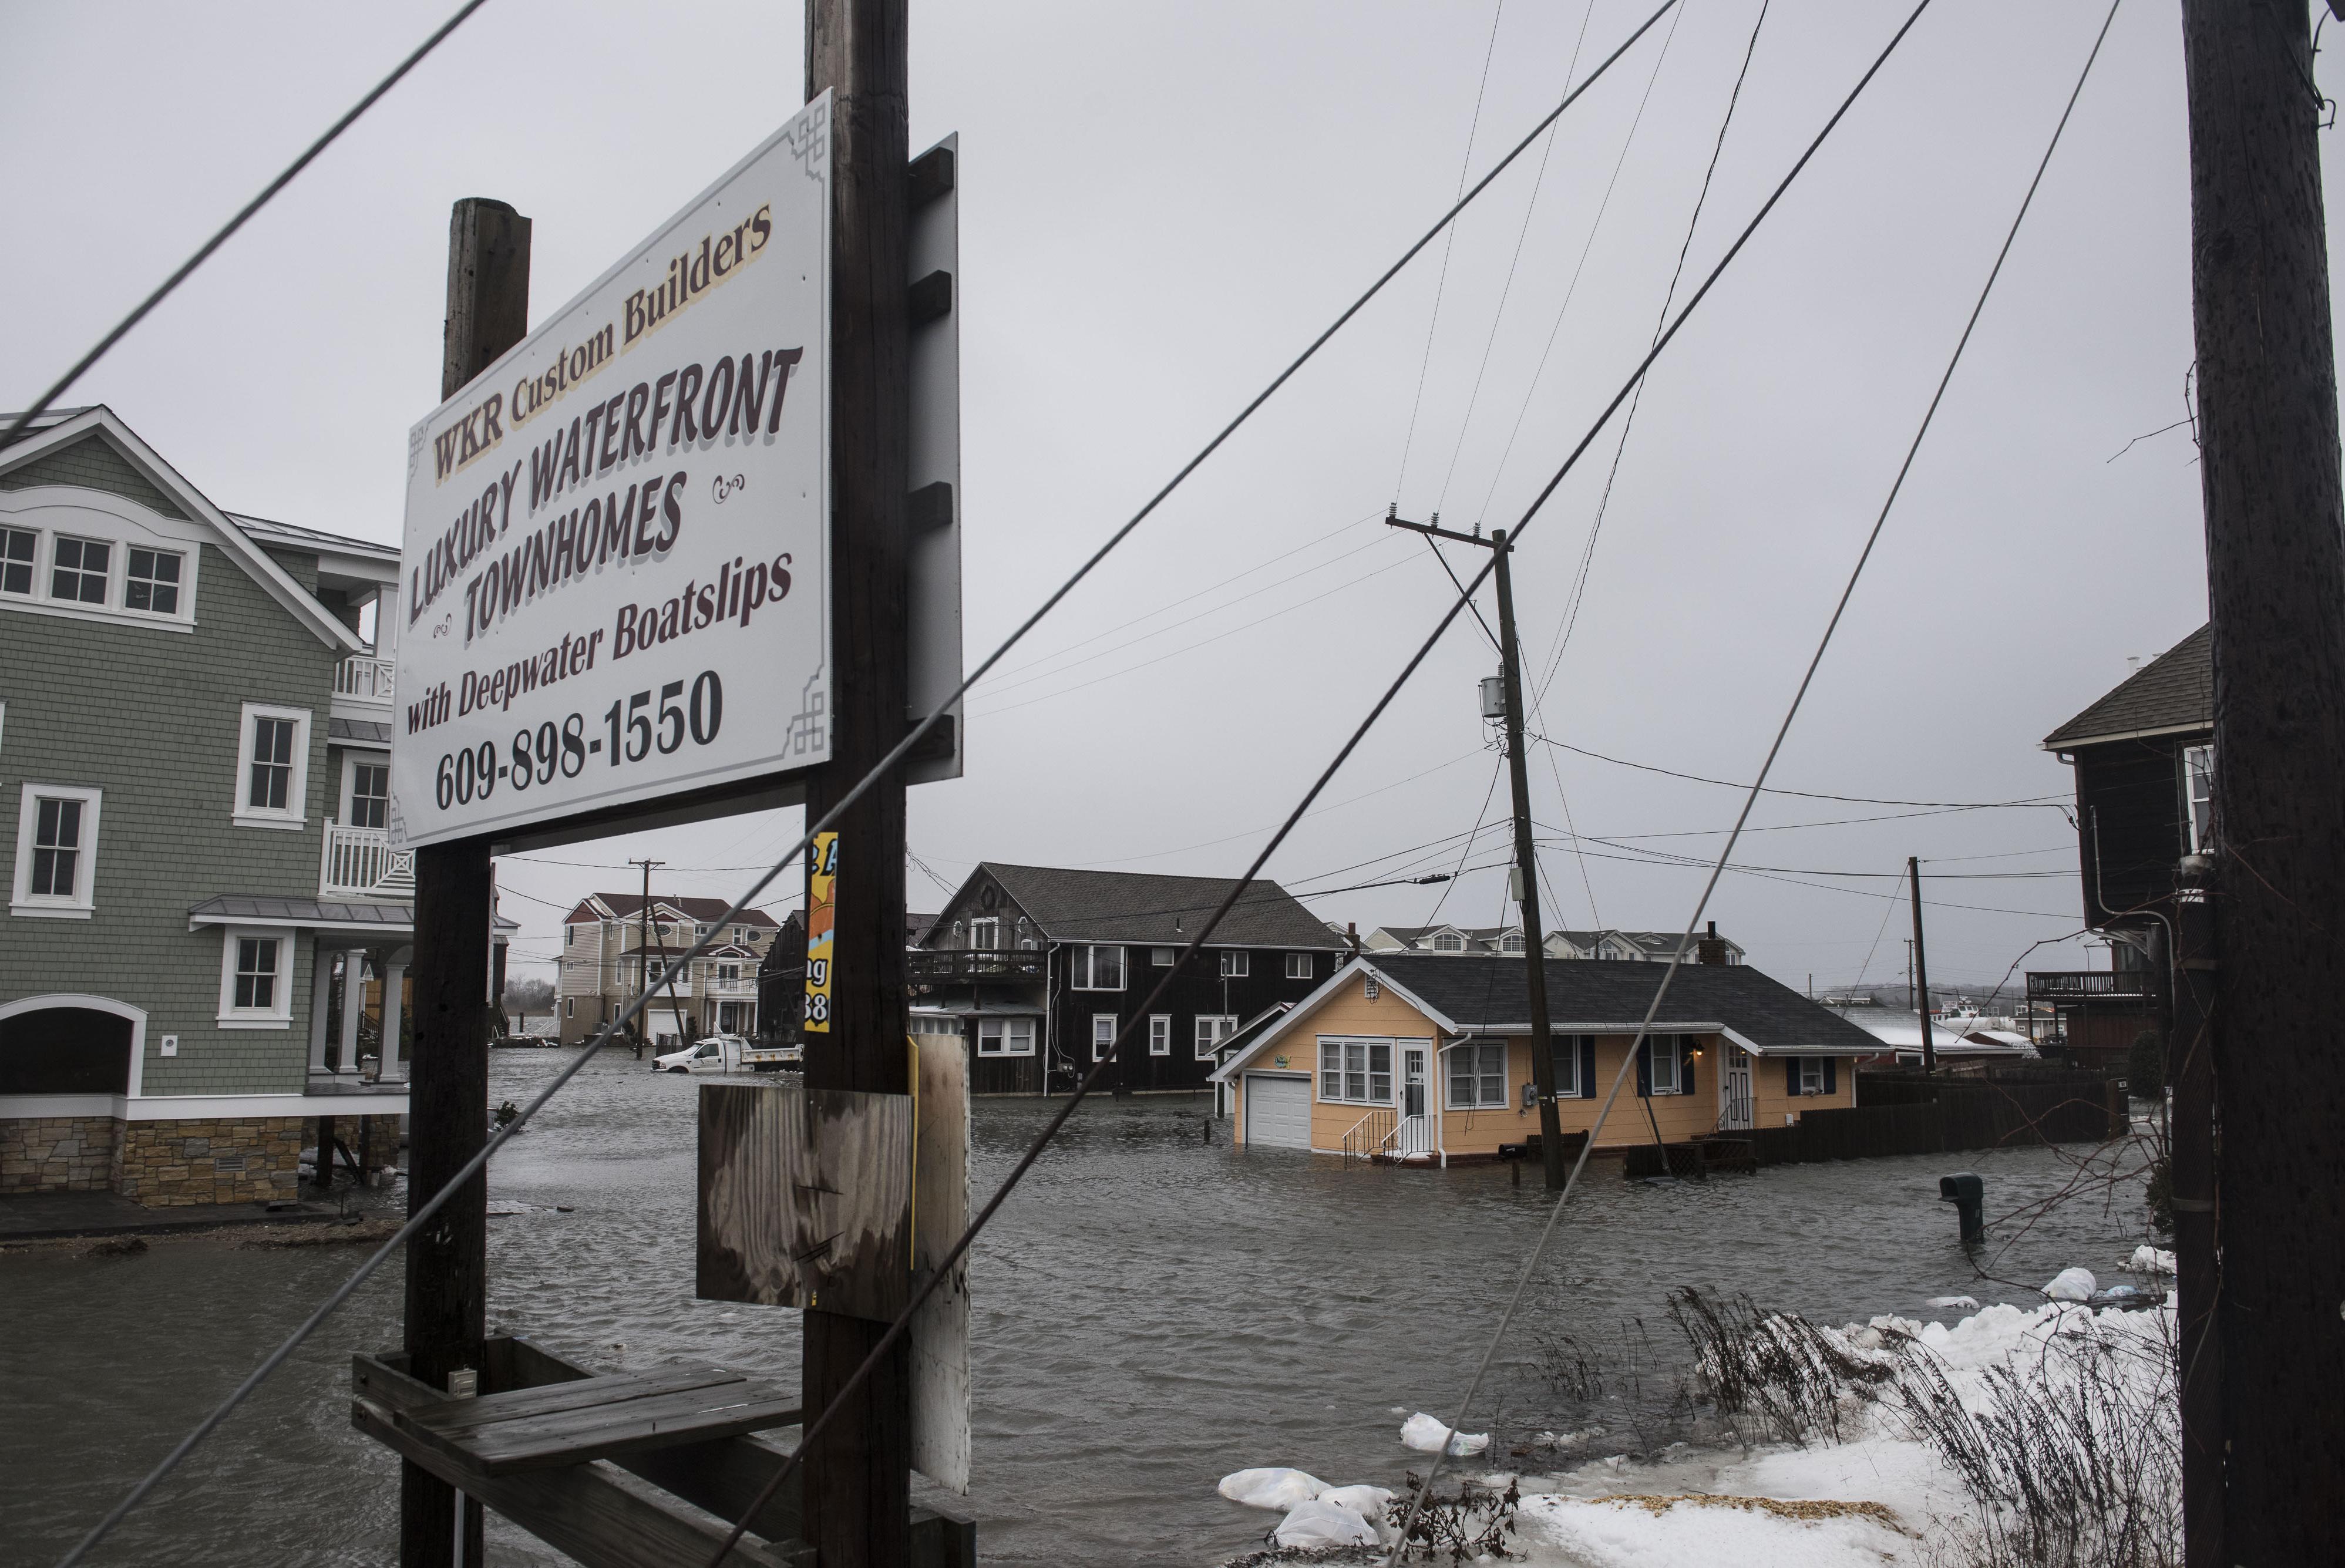 Winter Storm In Eastern U.S. Buries Cities, Floods Coast, Kills At Least 29